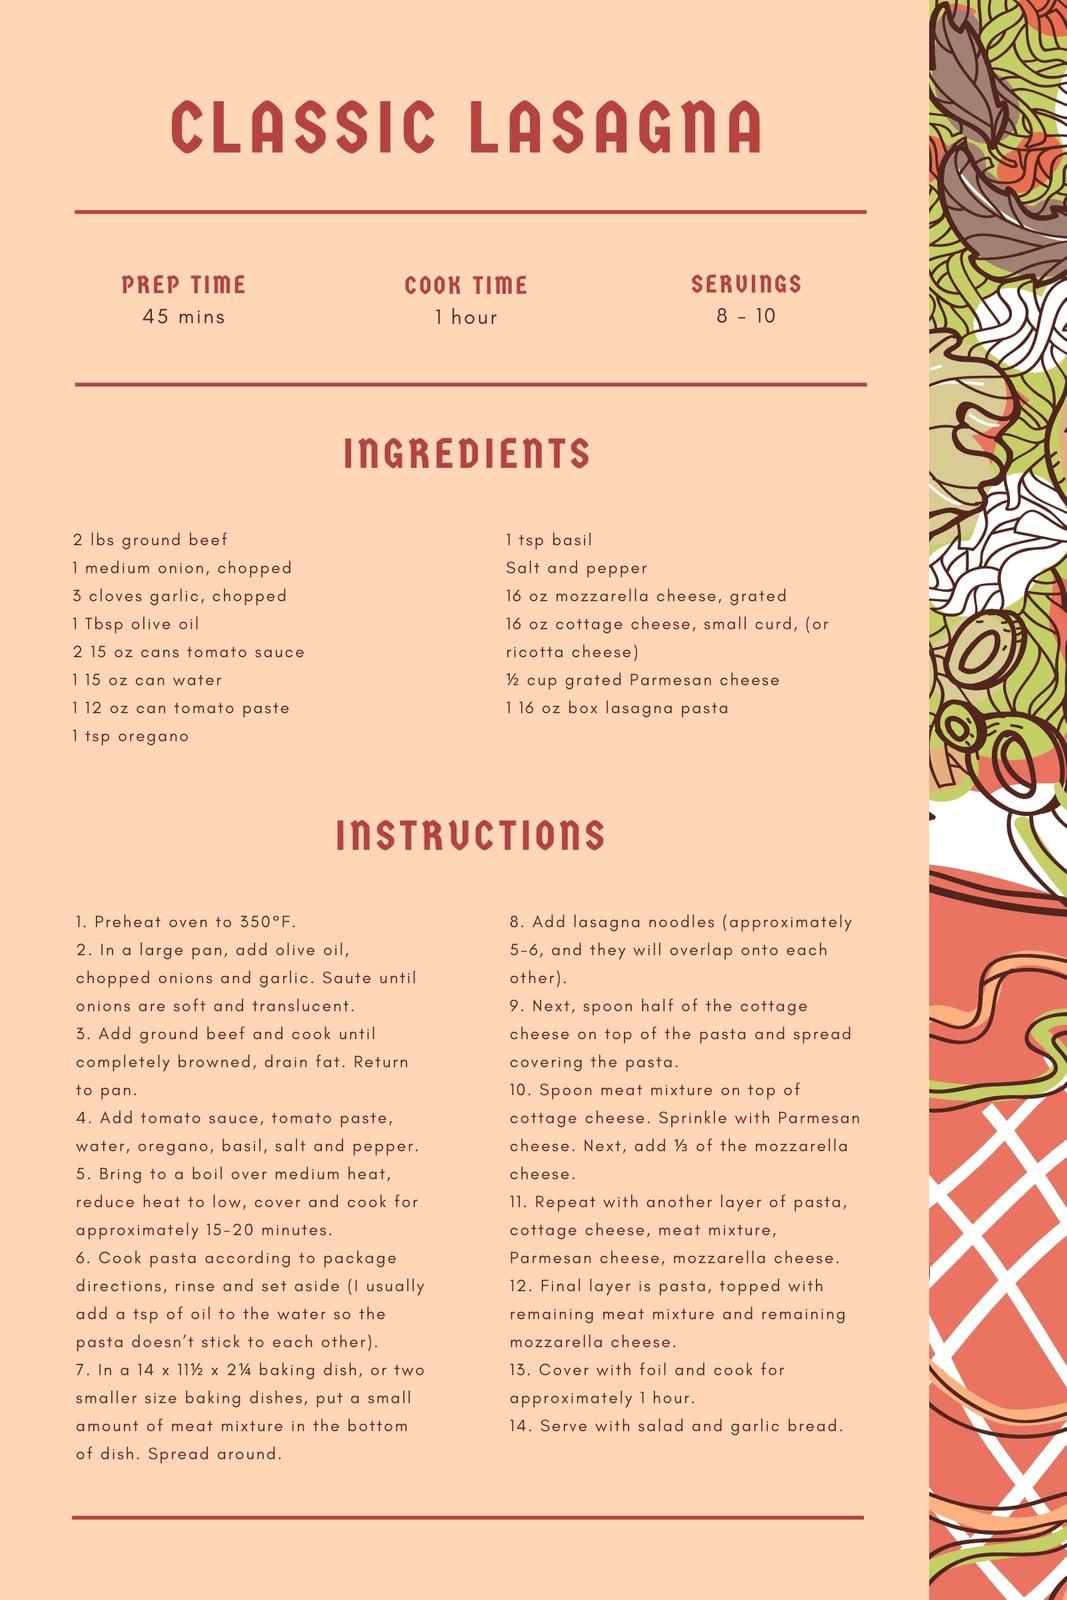 Red Classic Lasagna Illustration General Recipe Card